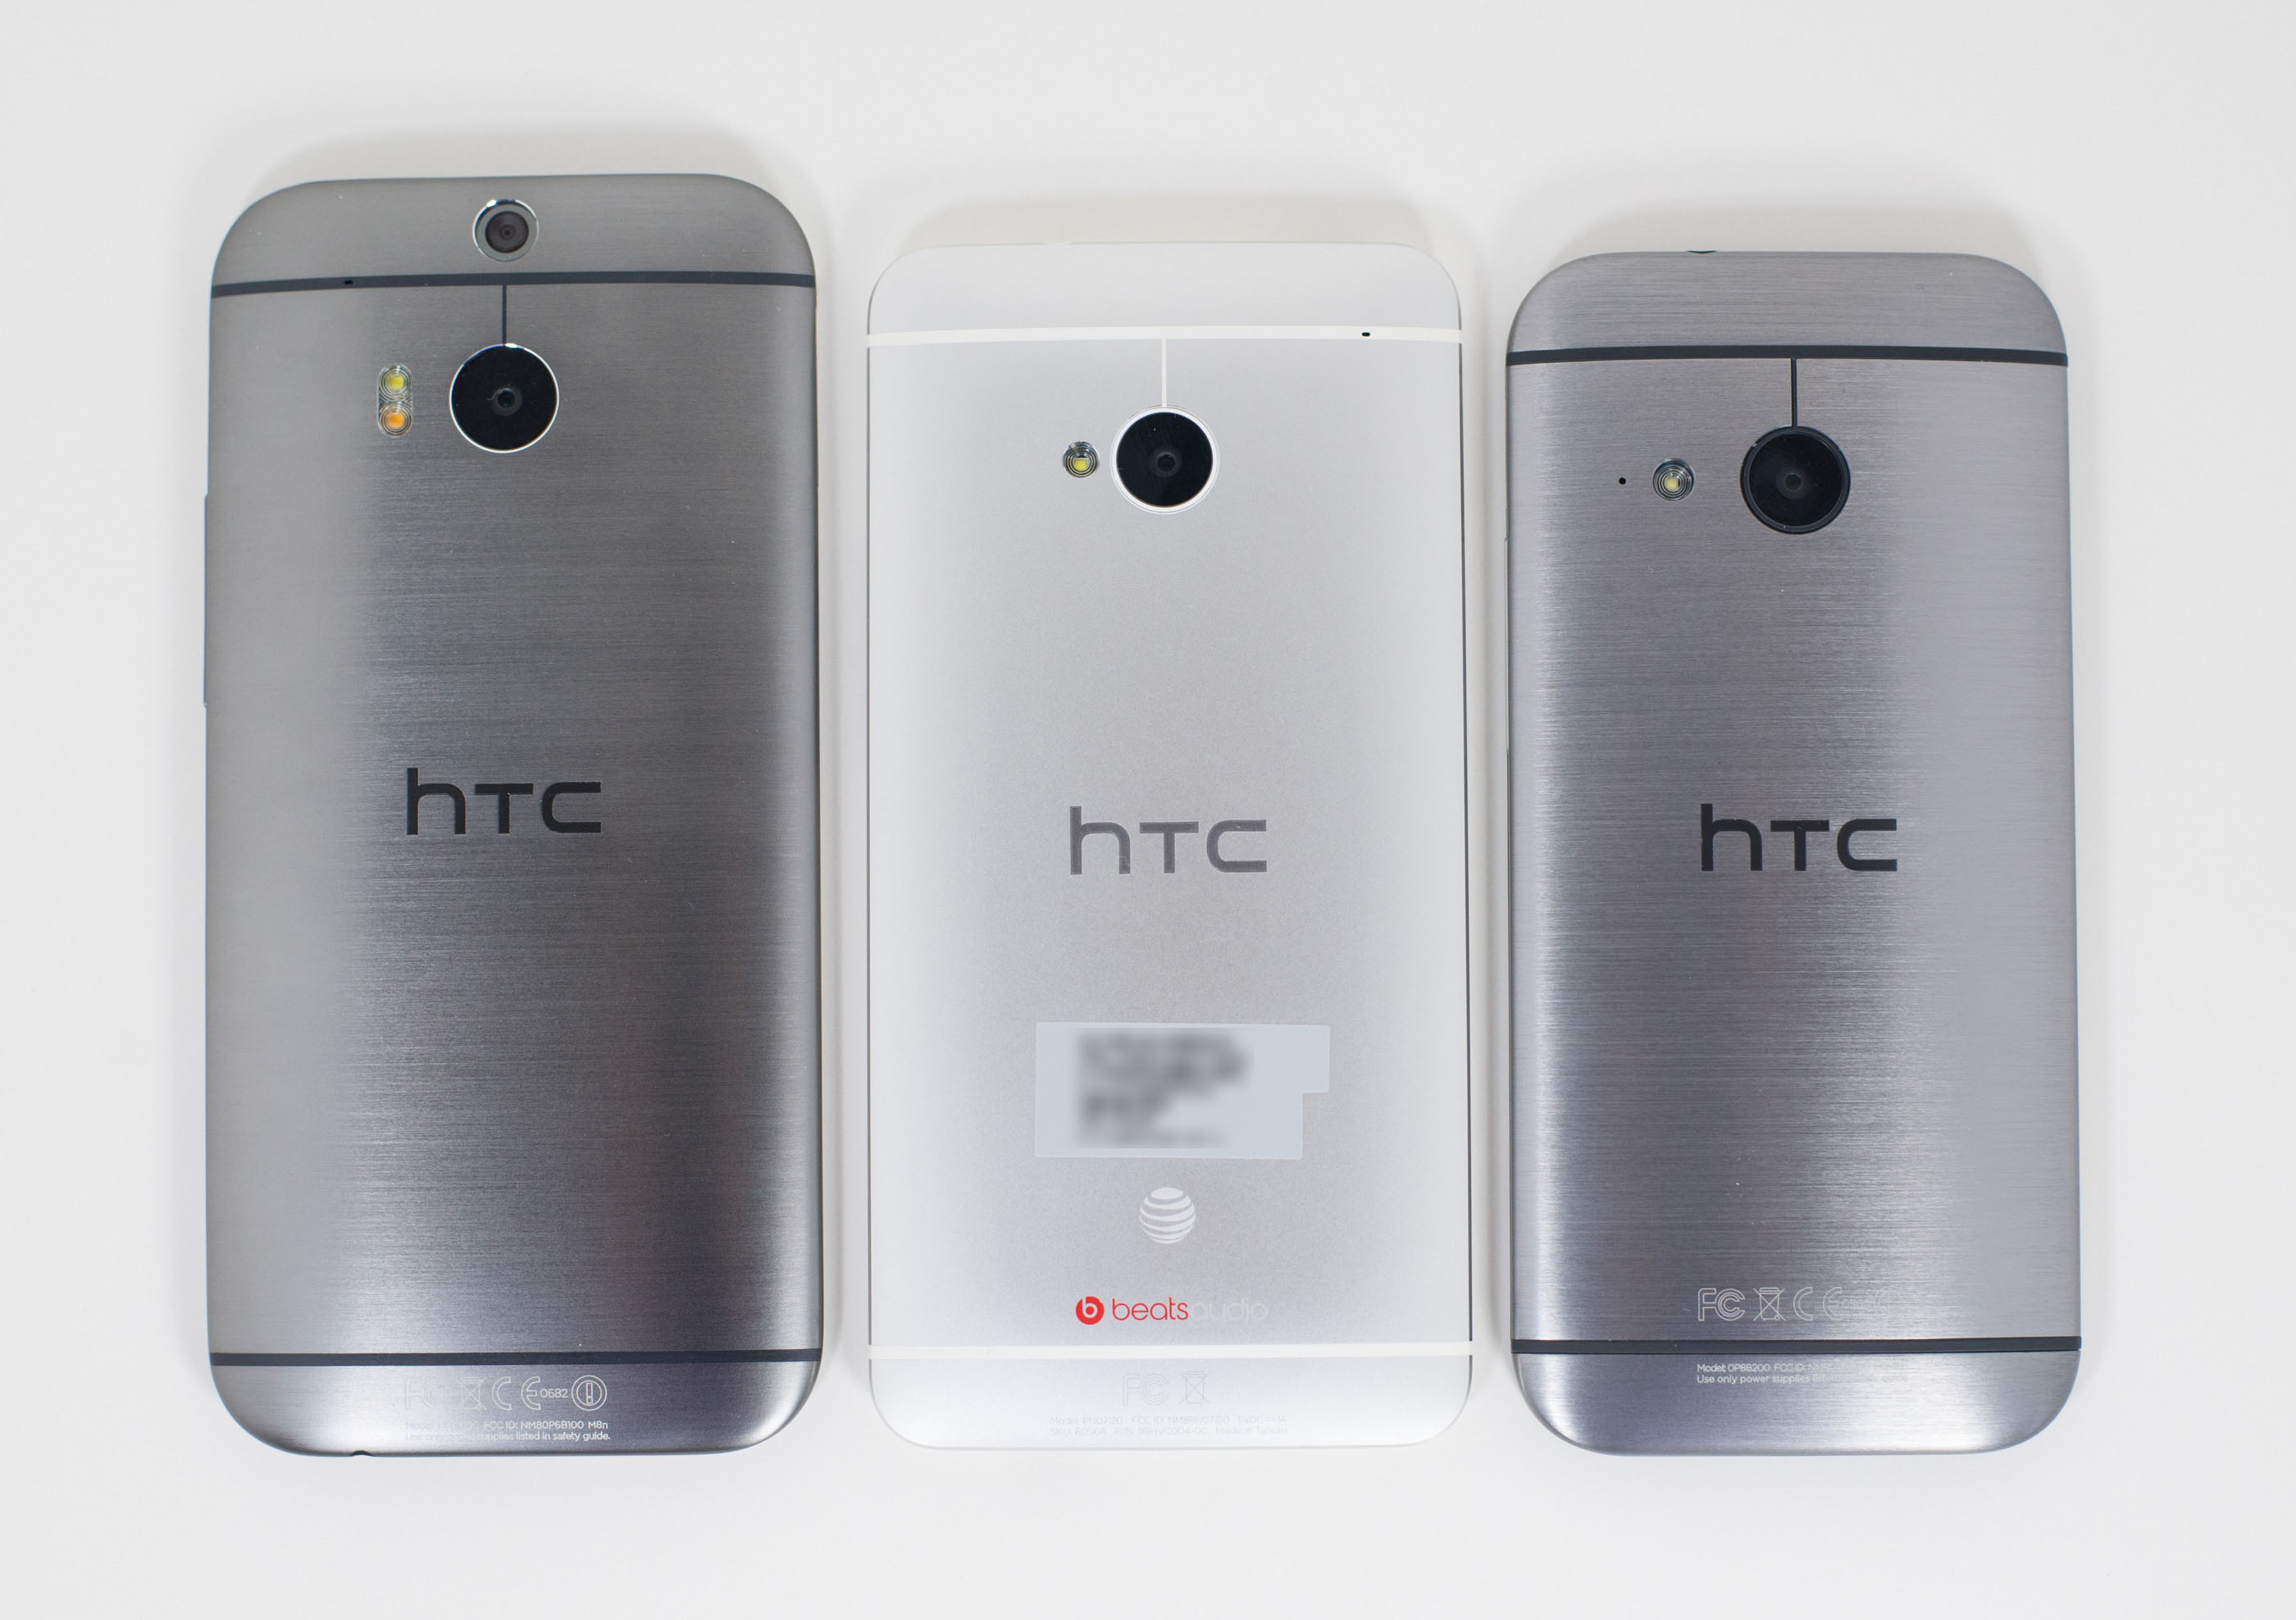 HTC One mini 2 Announcement